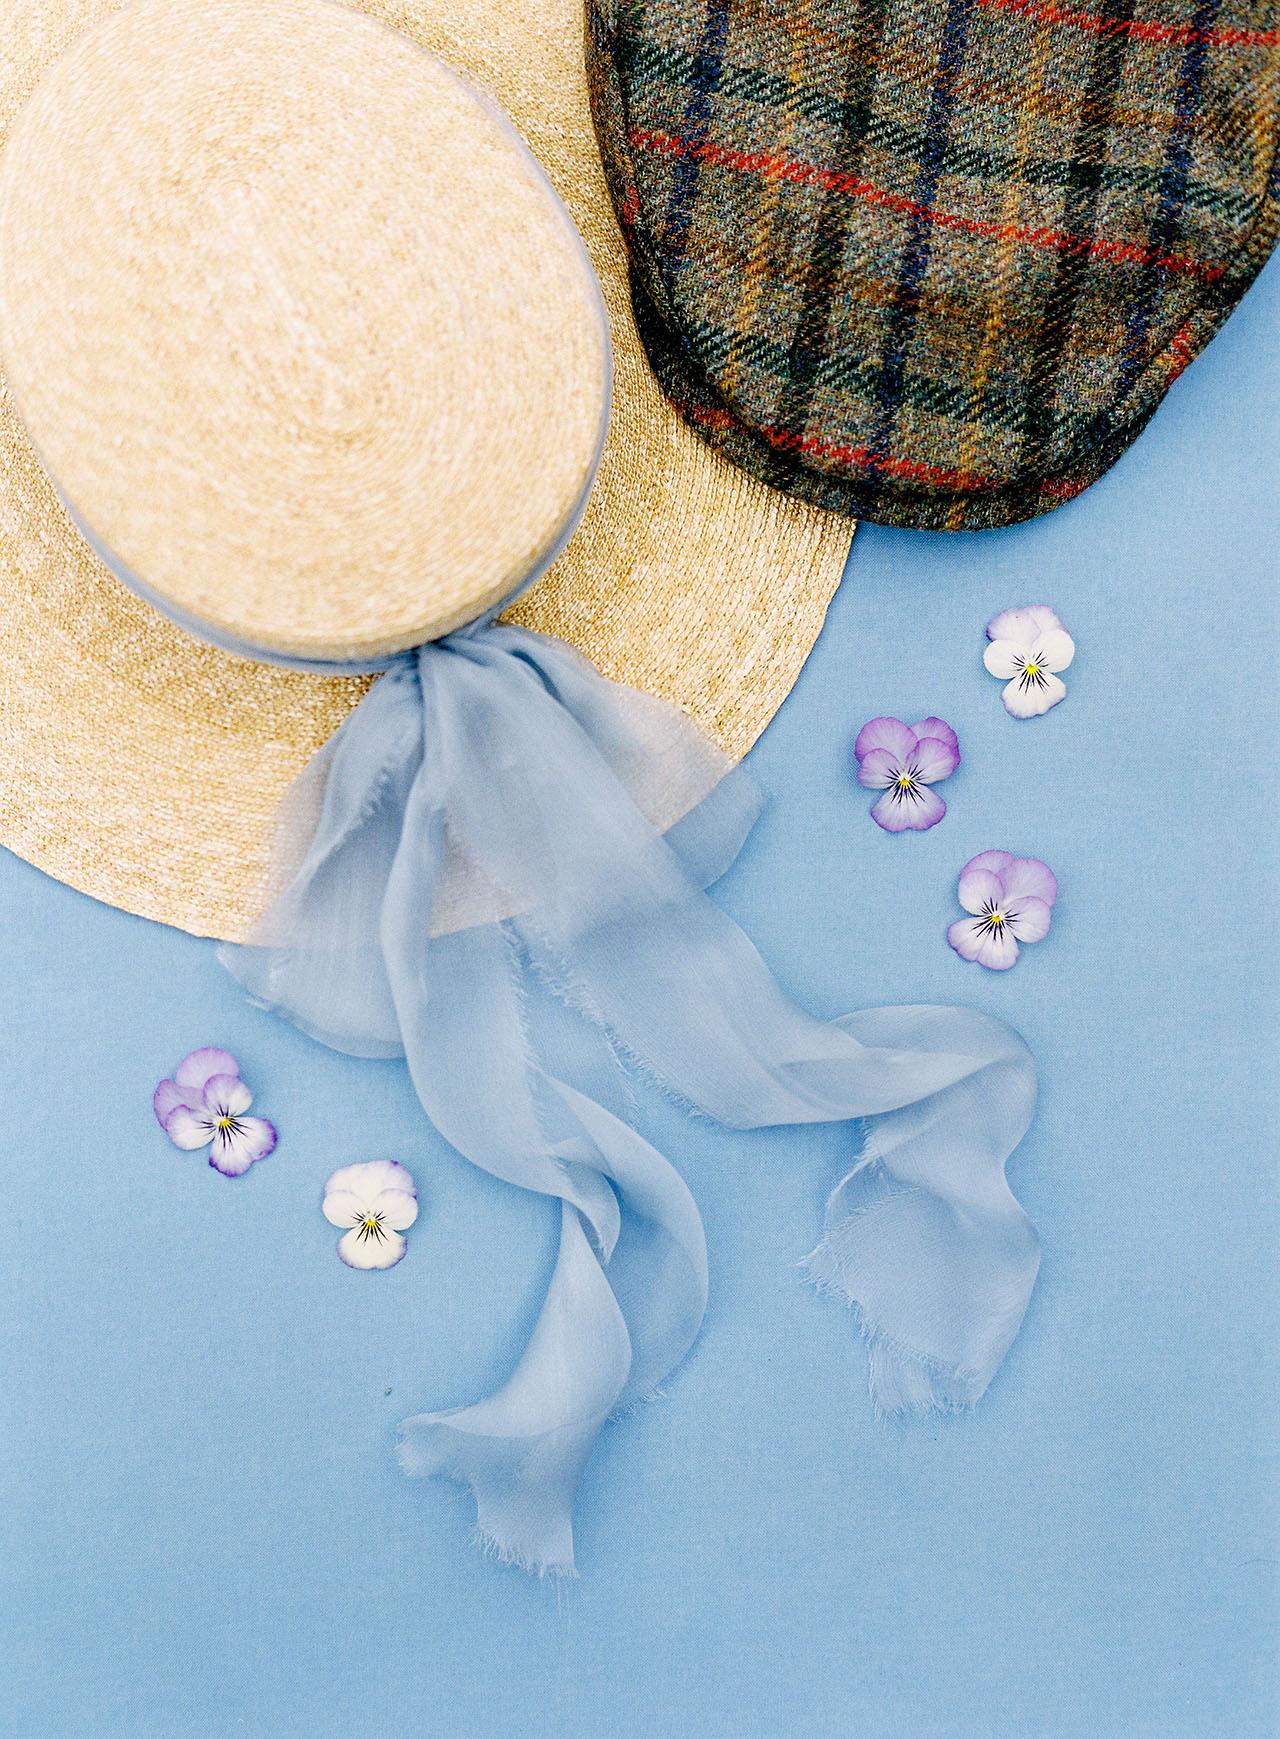 janelle stephen wedding hats